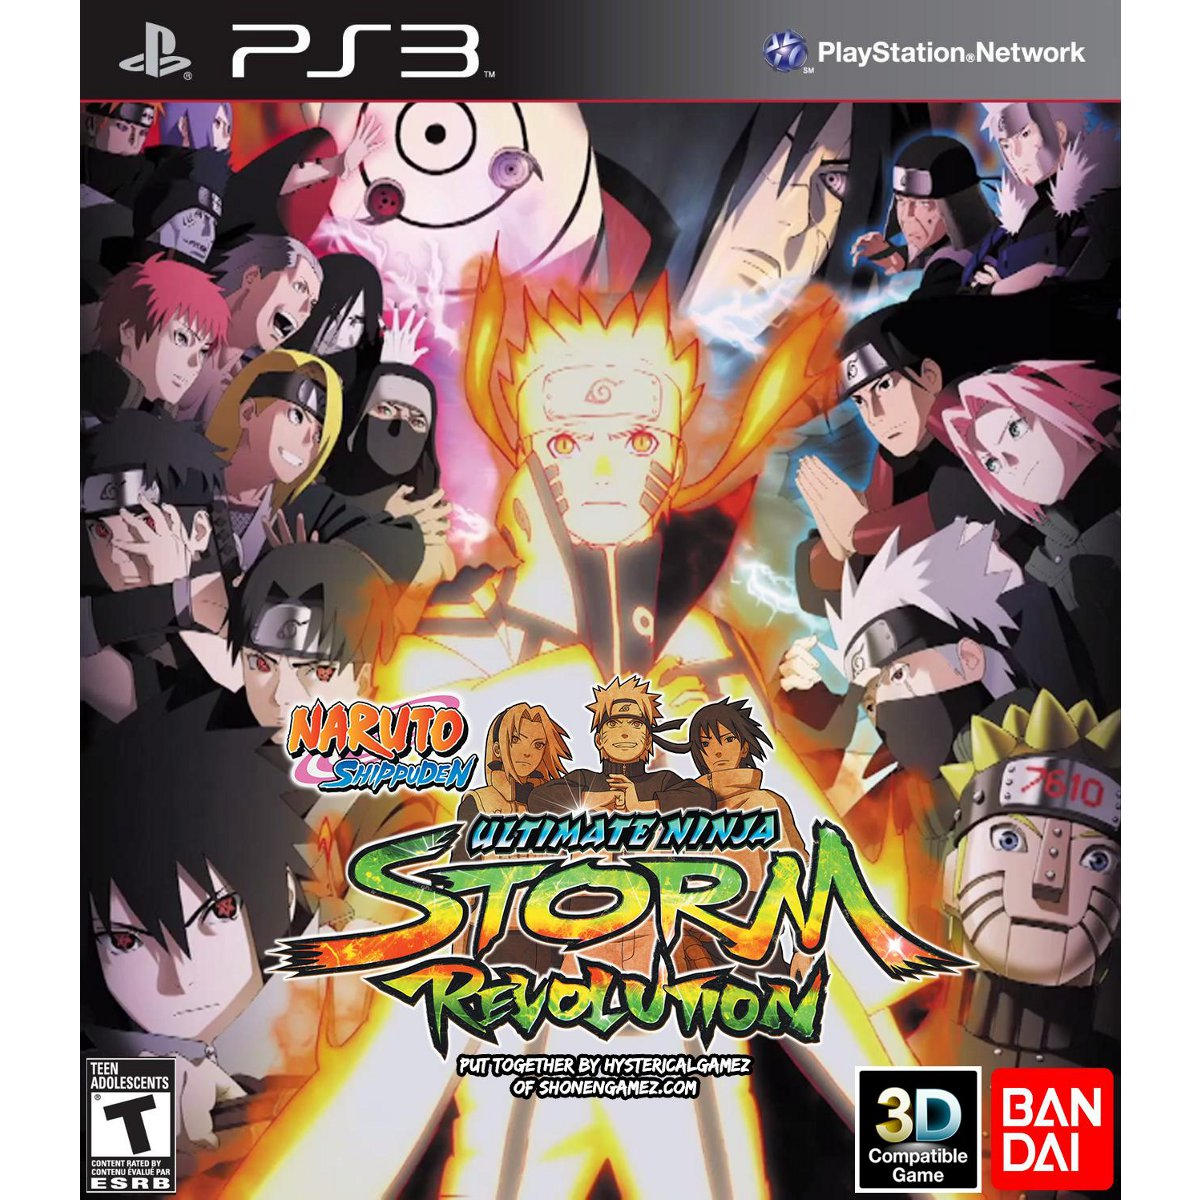 LDLC.com Naruto Shippuden : Ultimate Ninja Storm - Revolution (PS3) Naruto Shippuden : Ultimate Ninja Storm - Revolution (PS3)